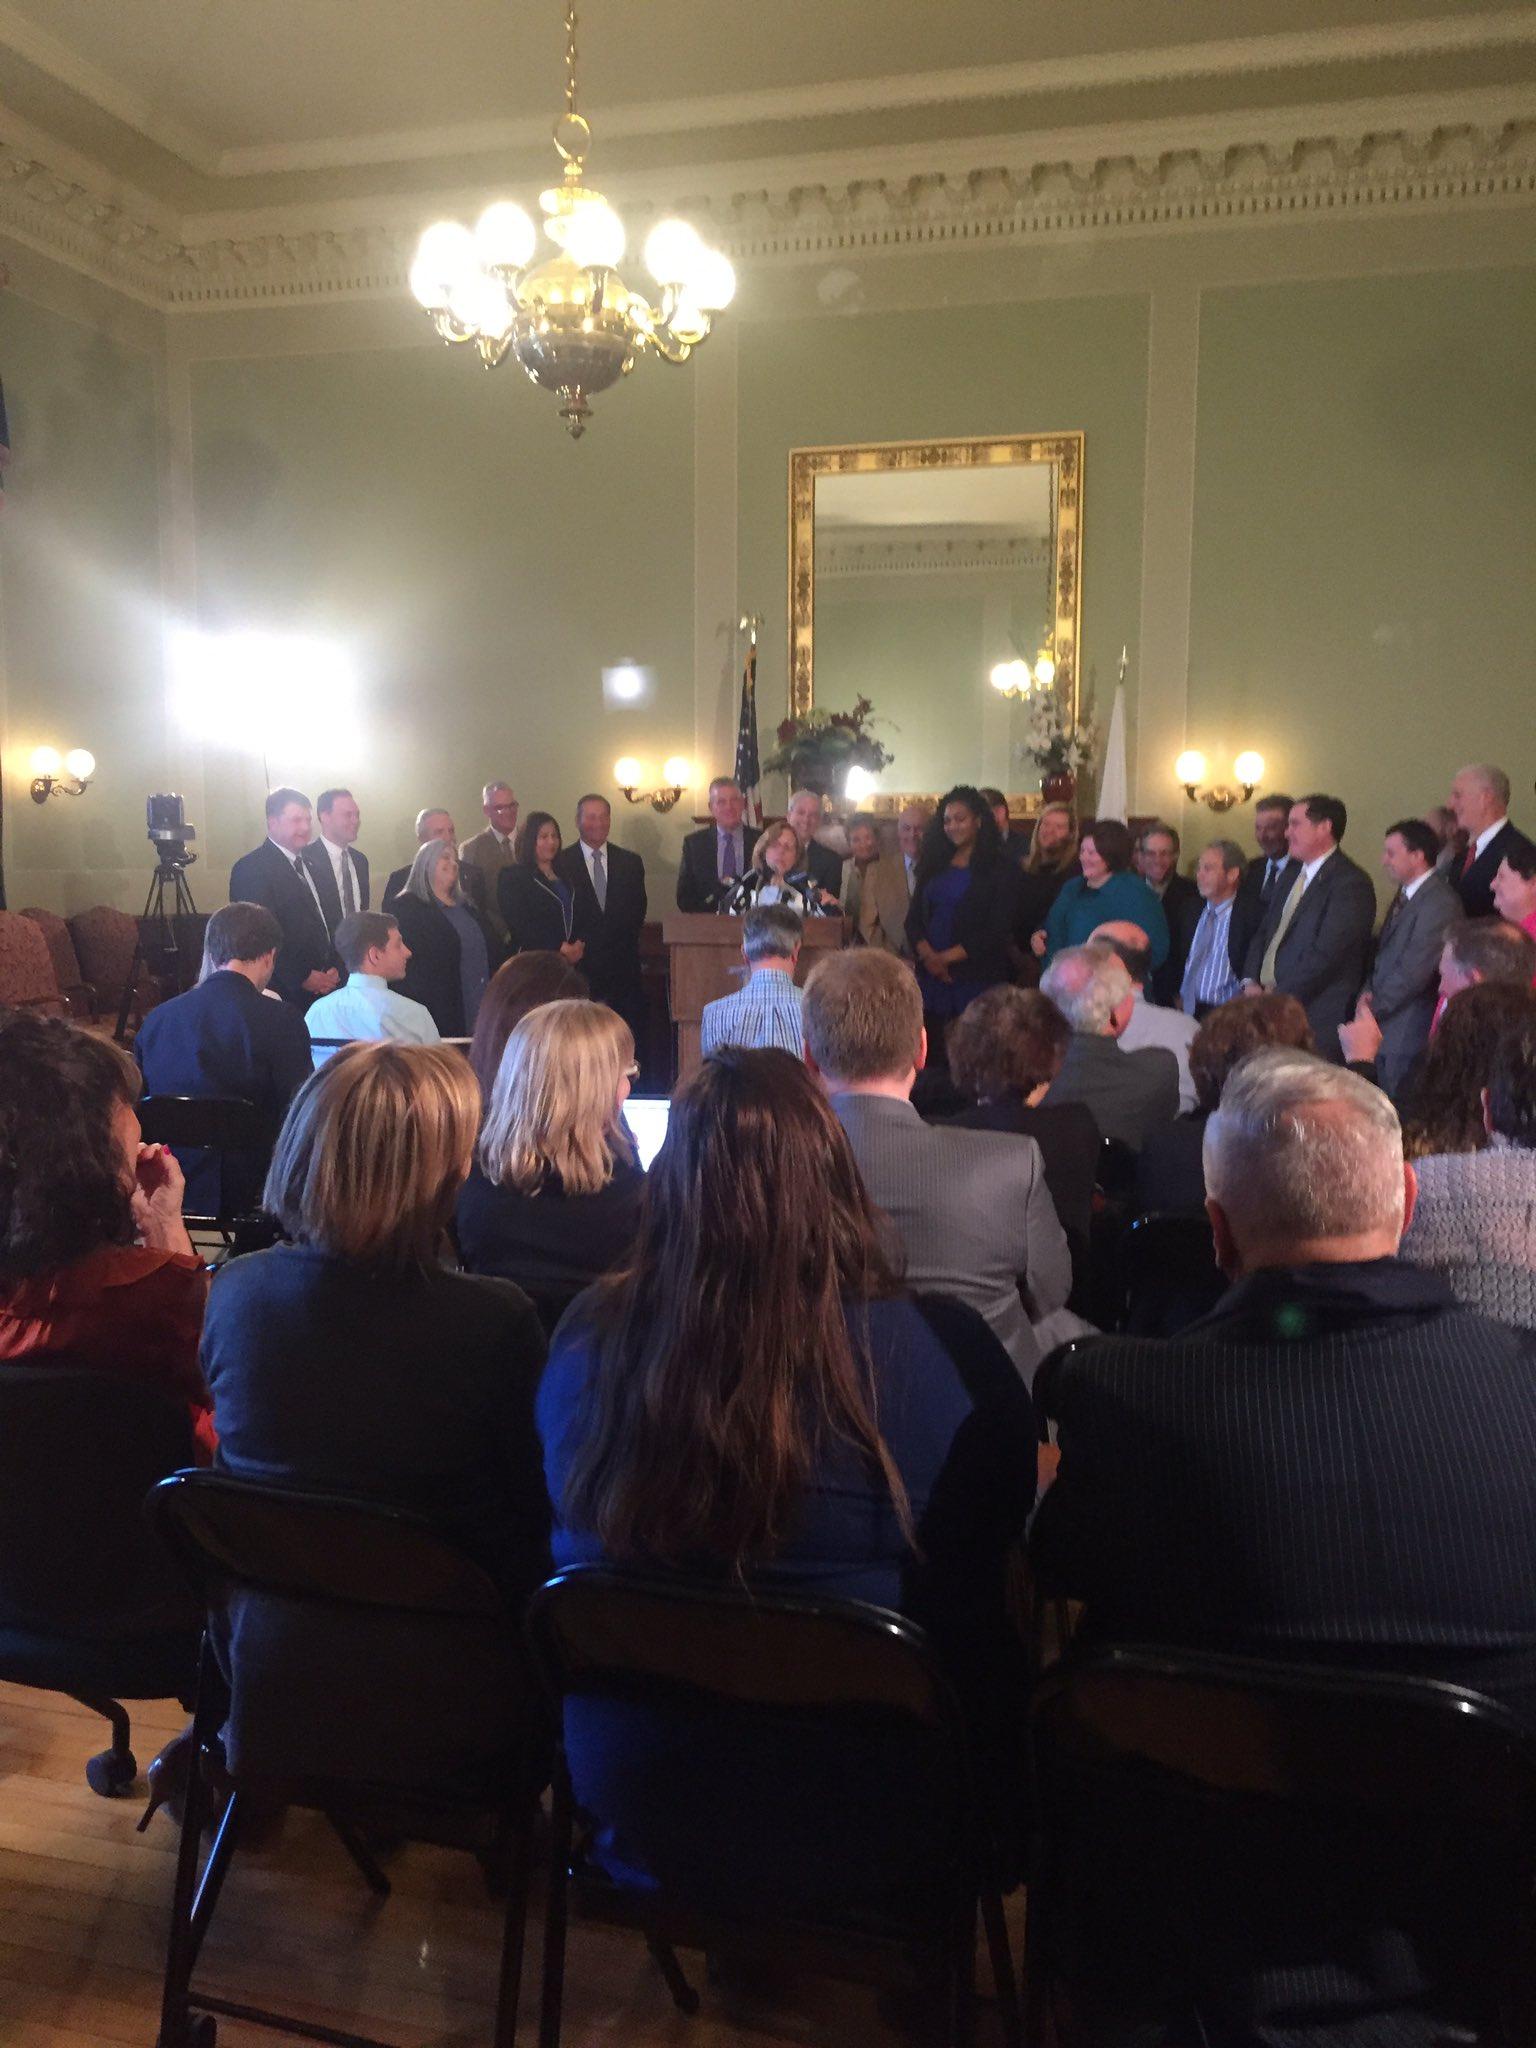 Senate President Teresa Paiva Weed steps down